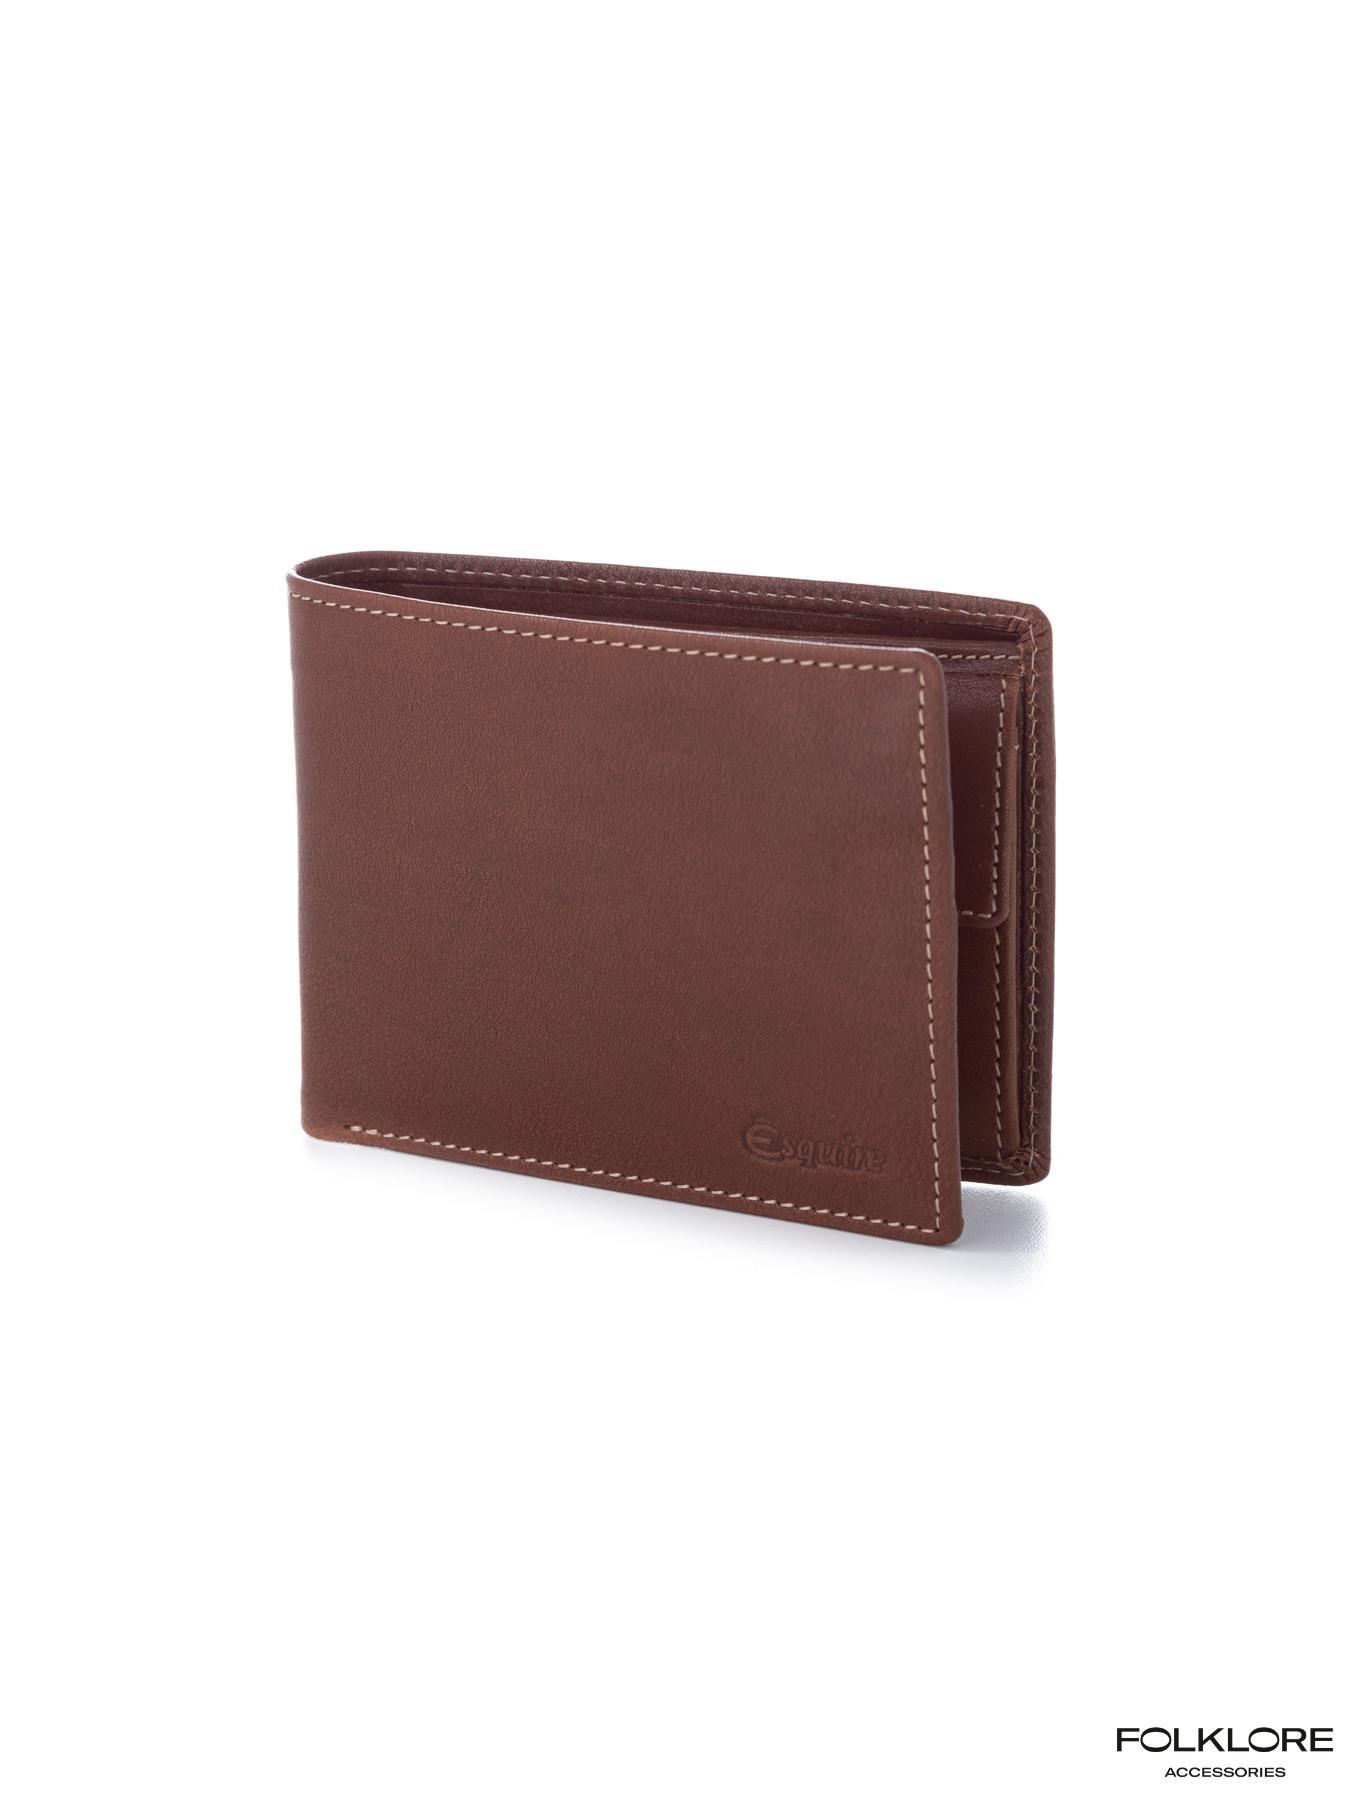 ESQUIRE Kožni braon novčanik sa RFID zaštitom